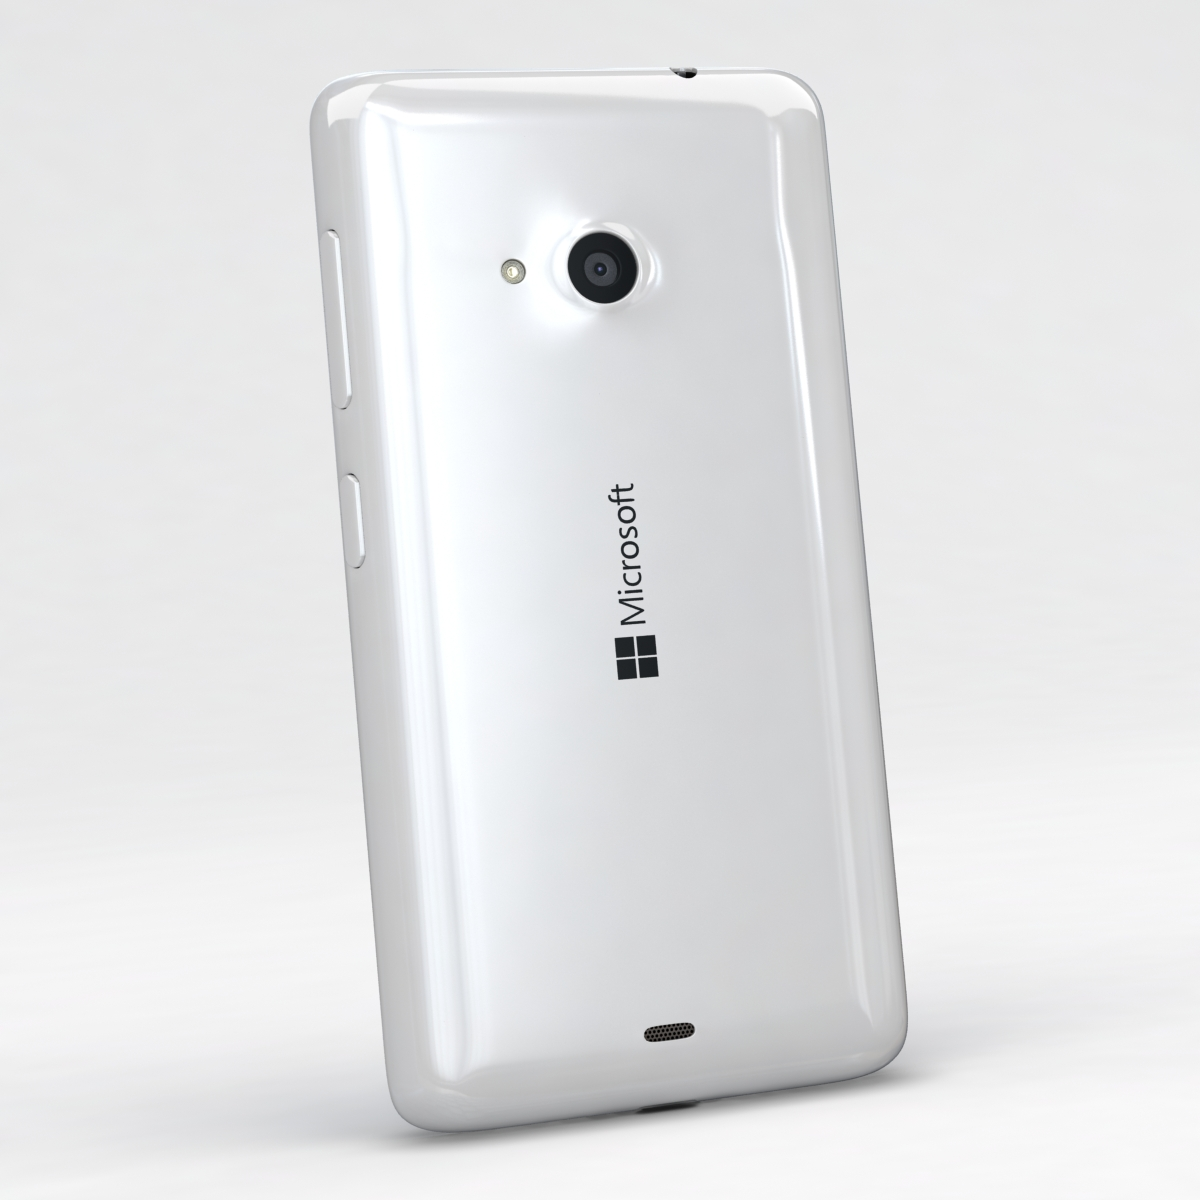 microsoft lumia 535 and dual sim white 3d model 3ds max fbx c4d obj 204283